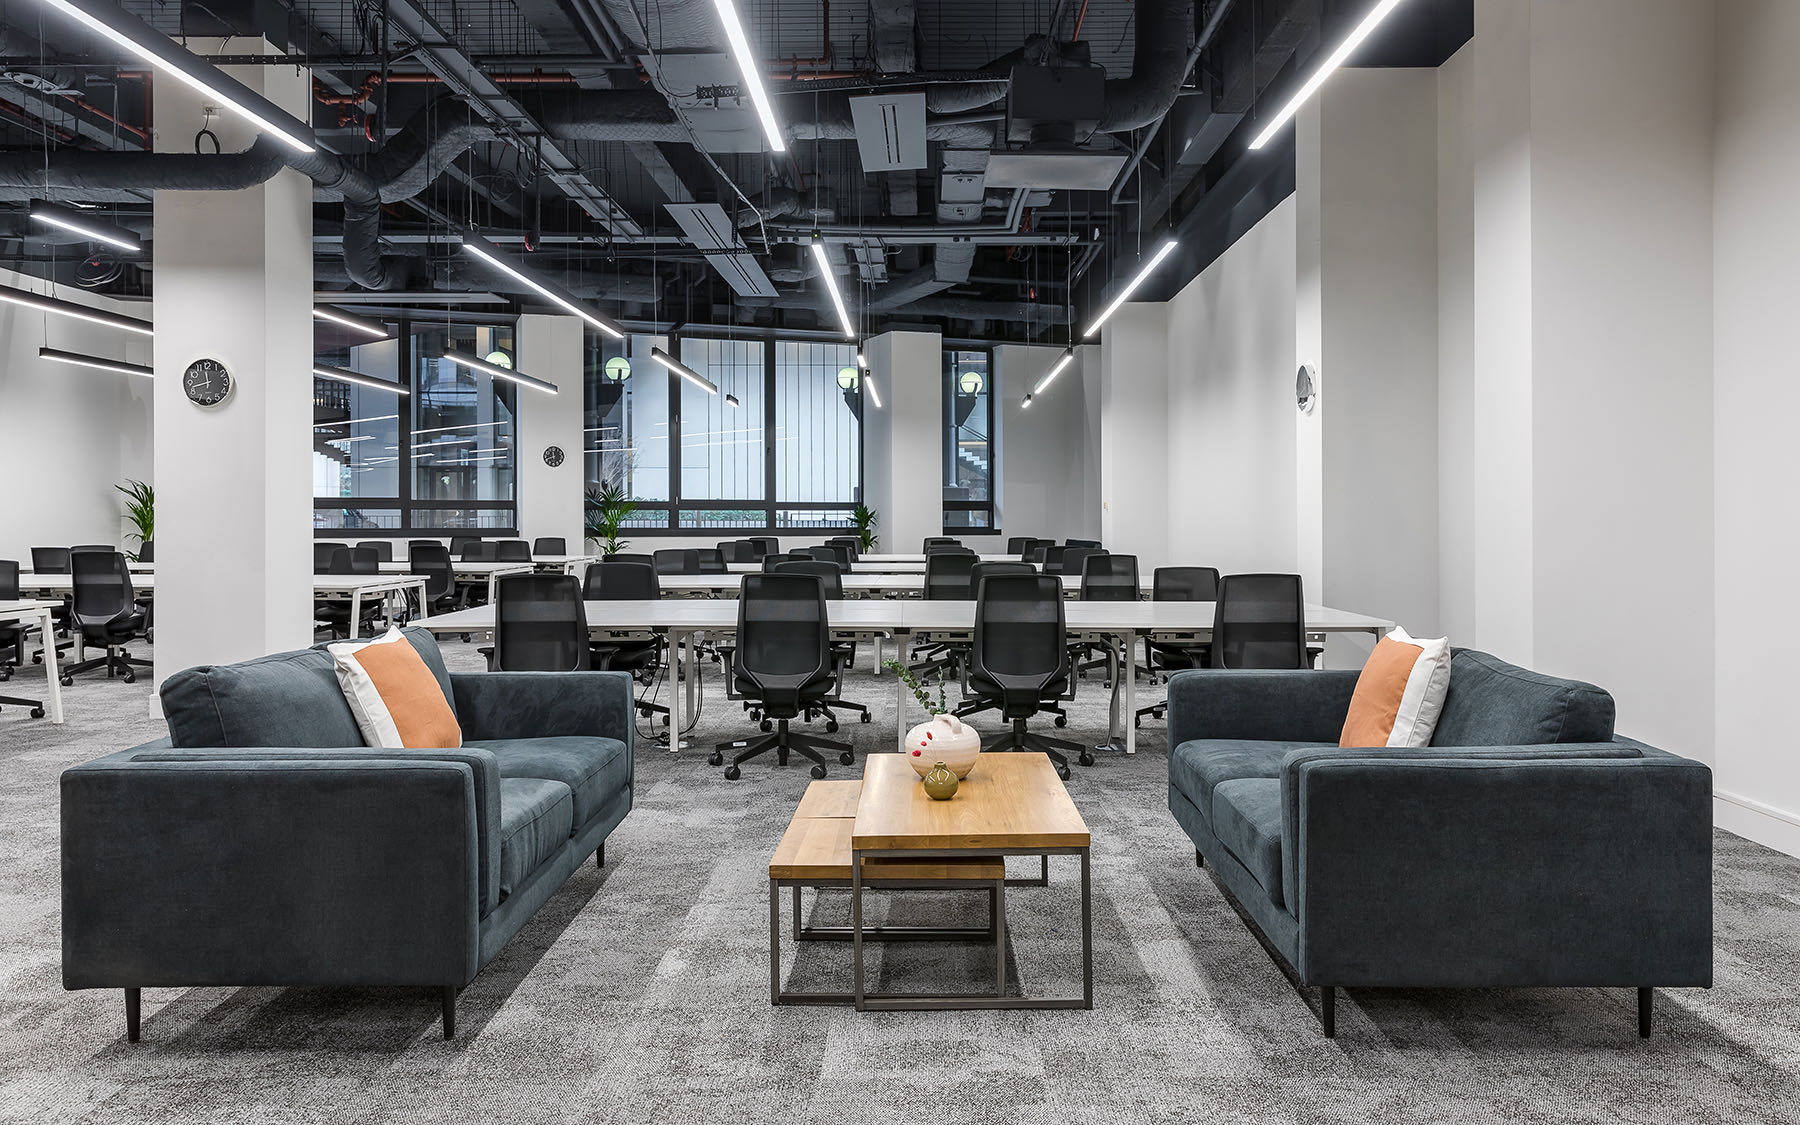 knotel-london-office-12